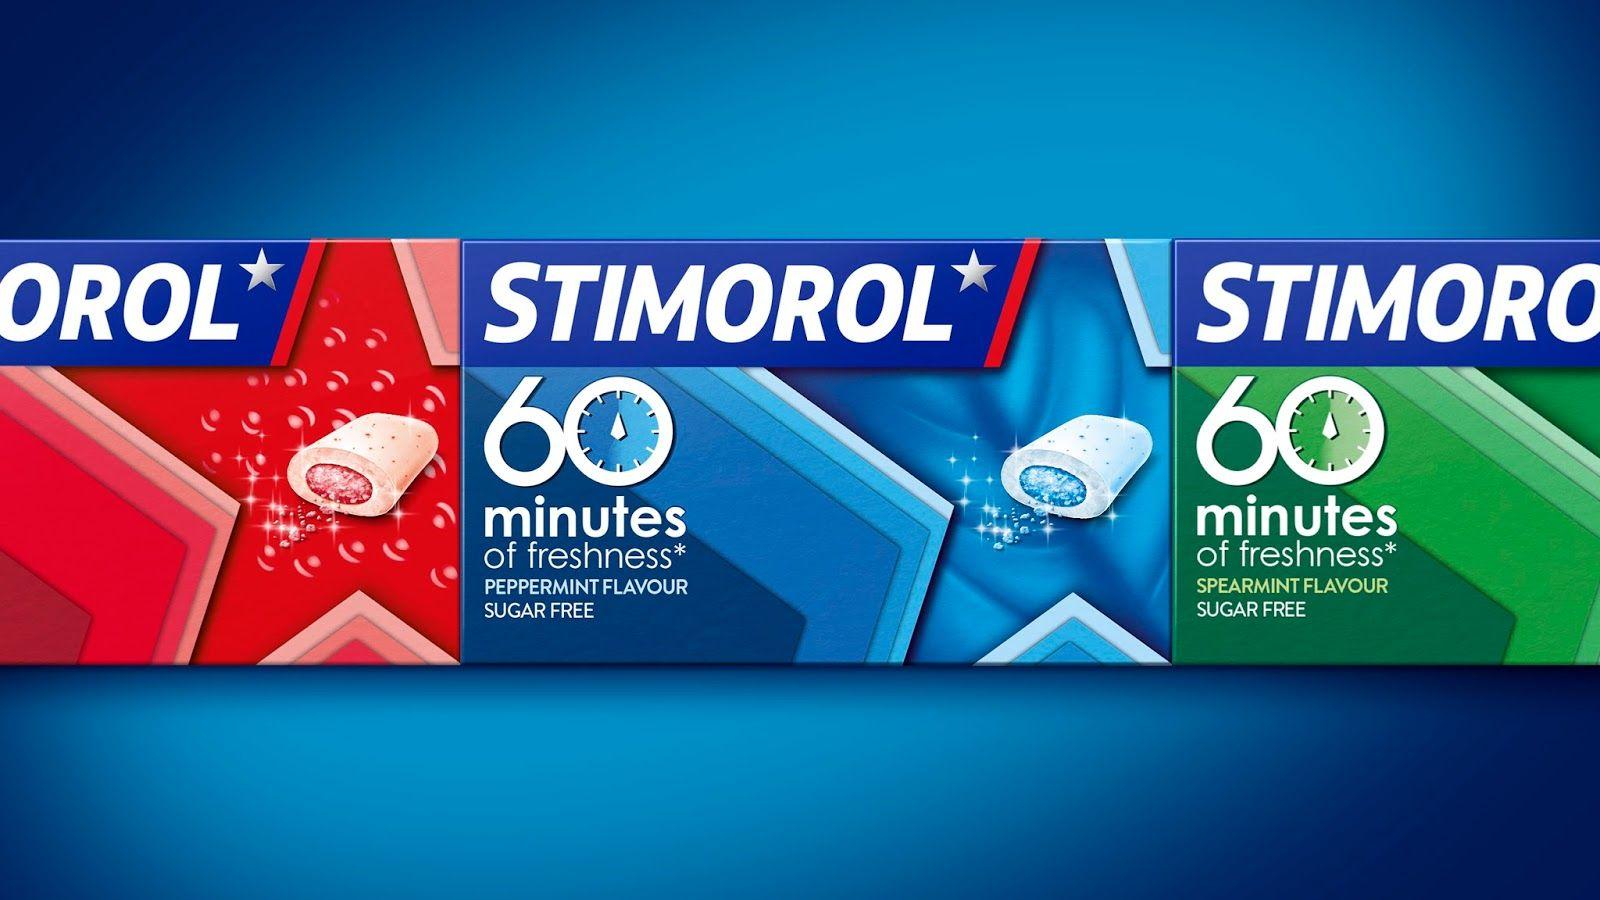 Stimorol Packaging design inspiration, Medical packaging